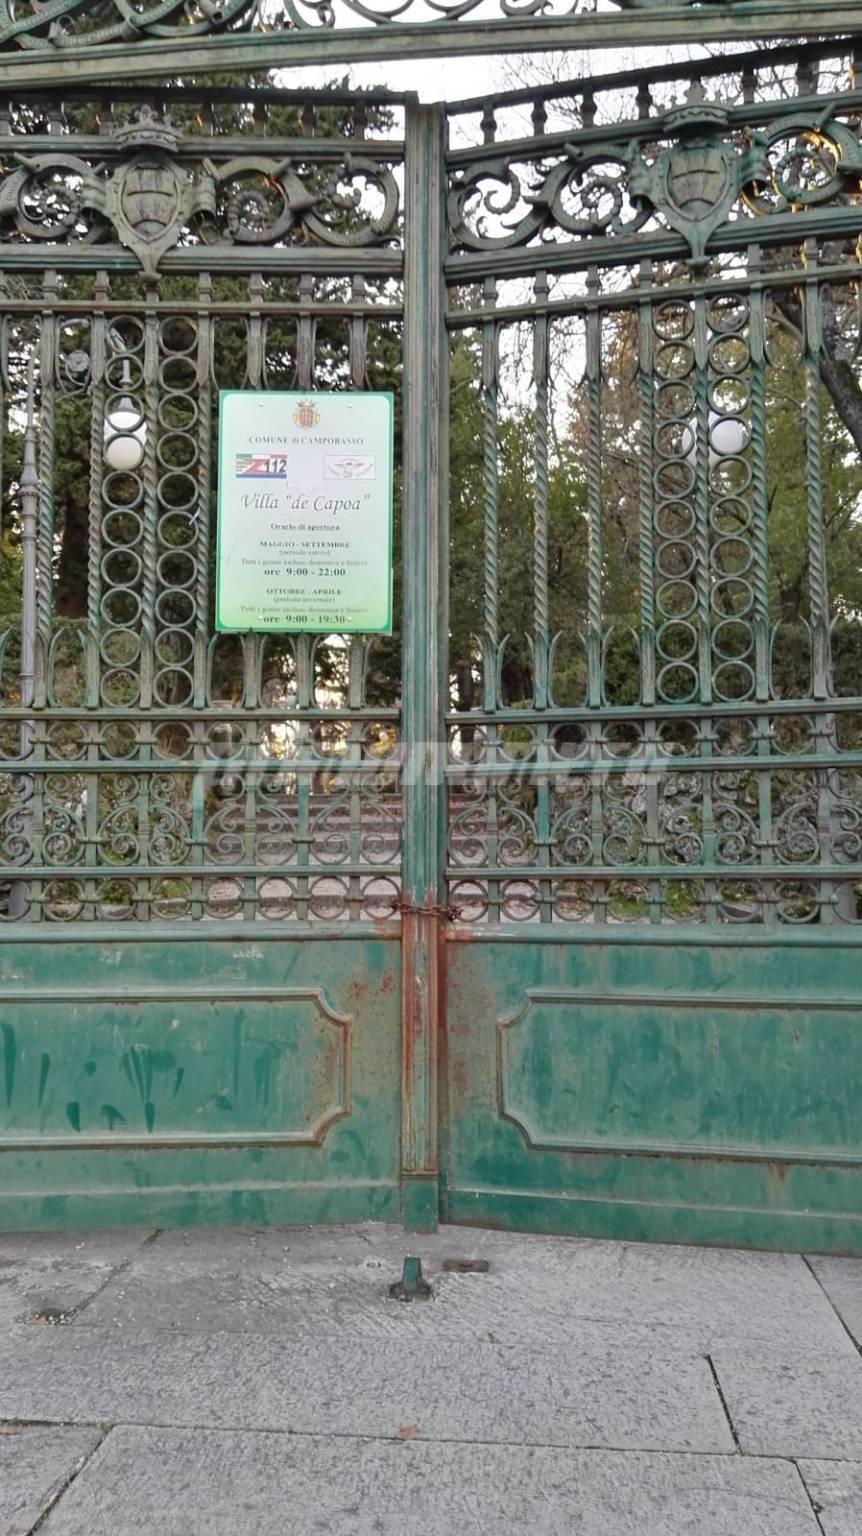 Villa de Capoa chiusa Campobasso